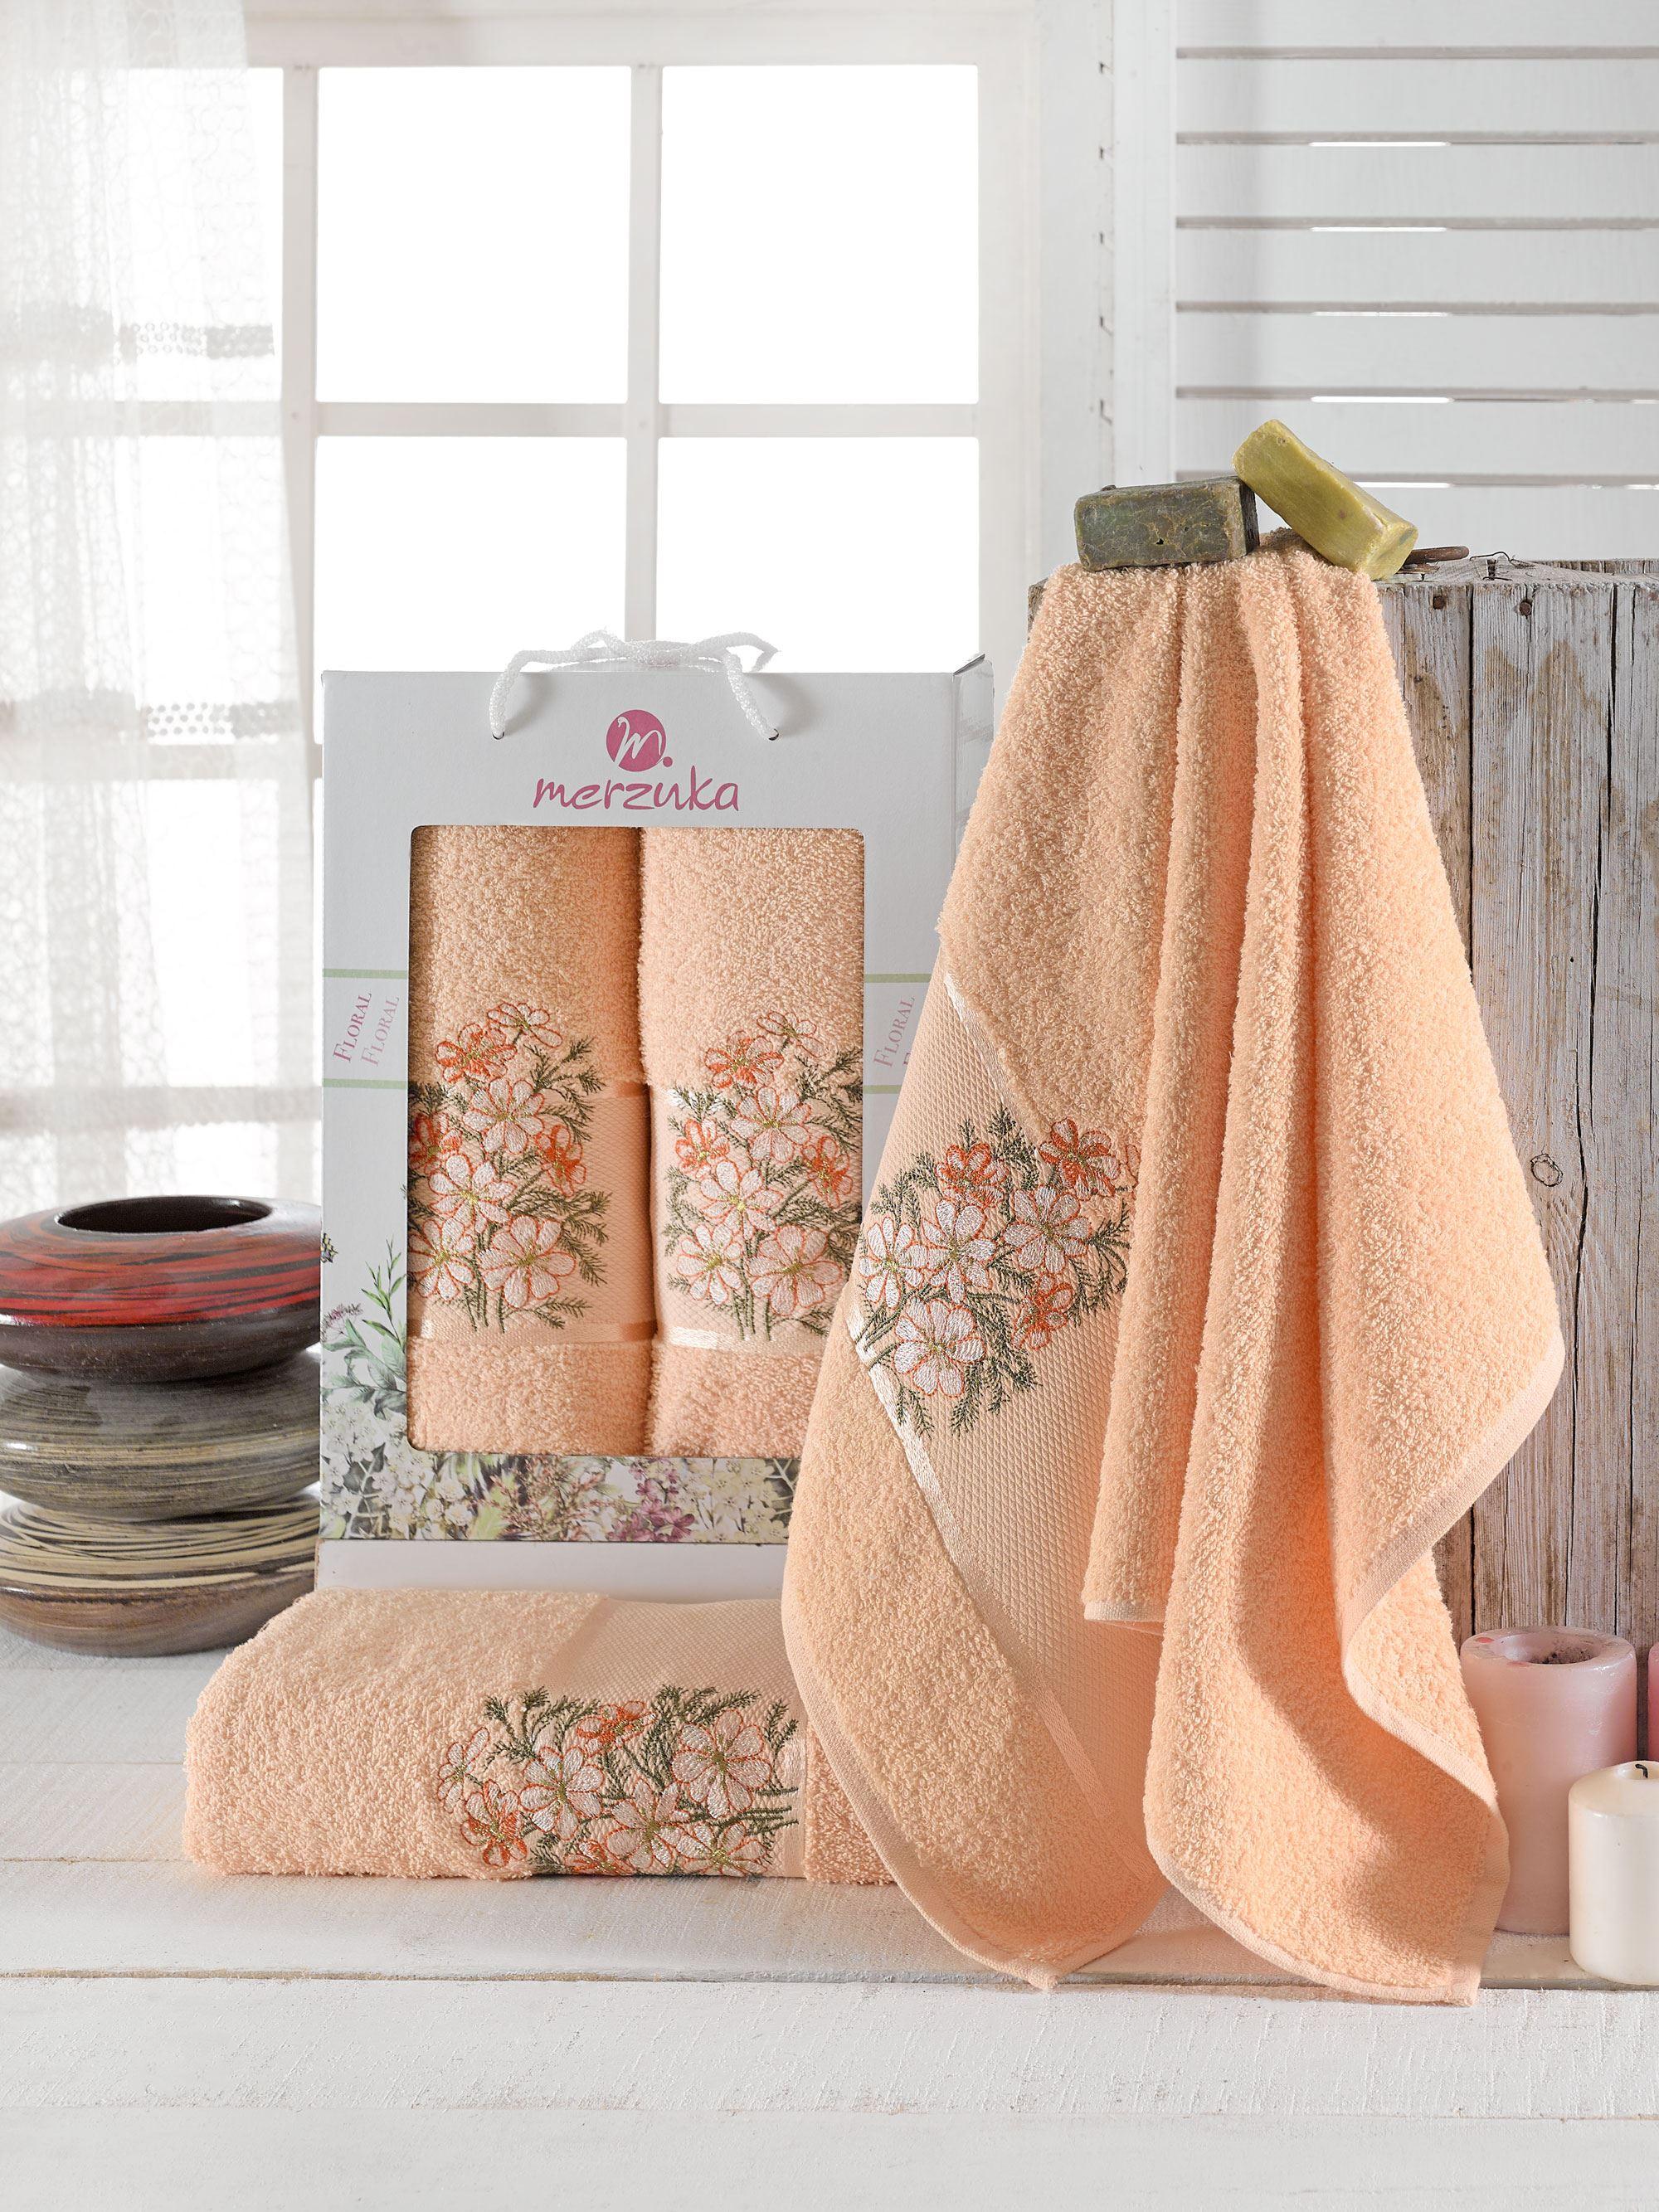 Полотенца Oran Merzuka Полотенце Floral Цвет: Оранжевый (50х80 см,70х130 см) оранжевый prime м 50х90 70х130 в коробке набор полотенец фиеста